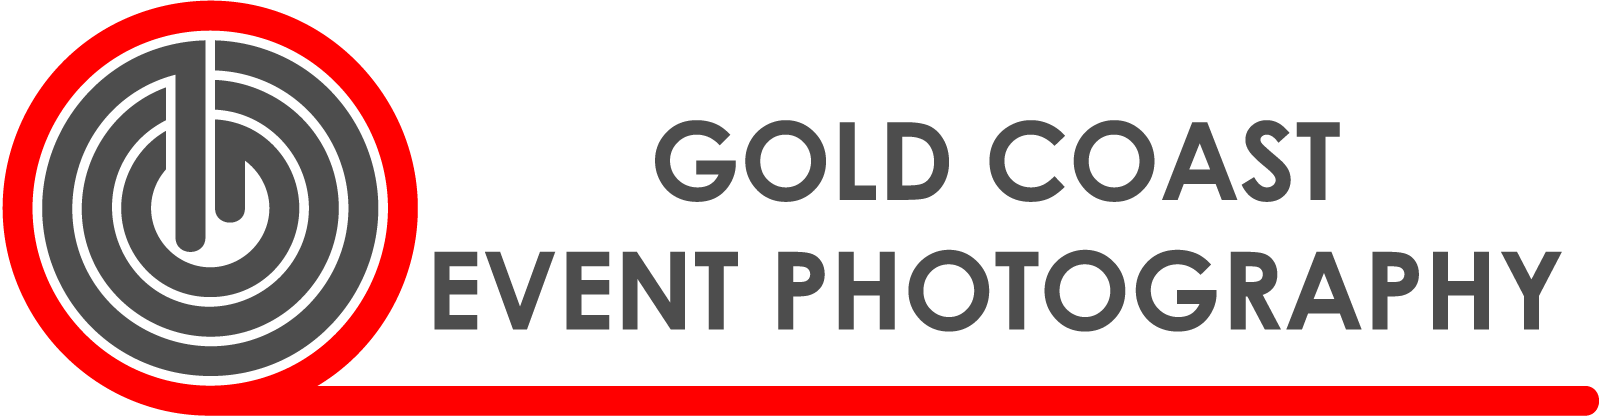 GoldCoastEventPhotography-Banner-Logo colour.png